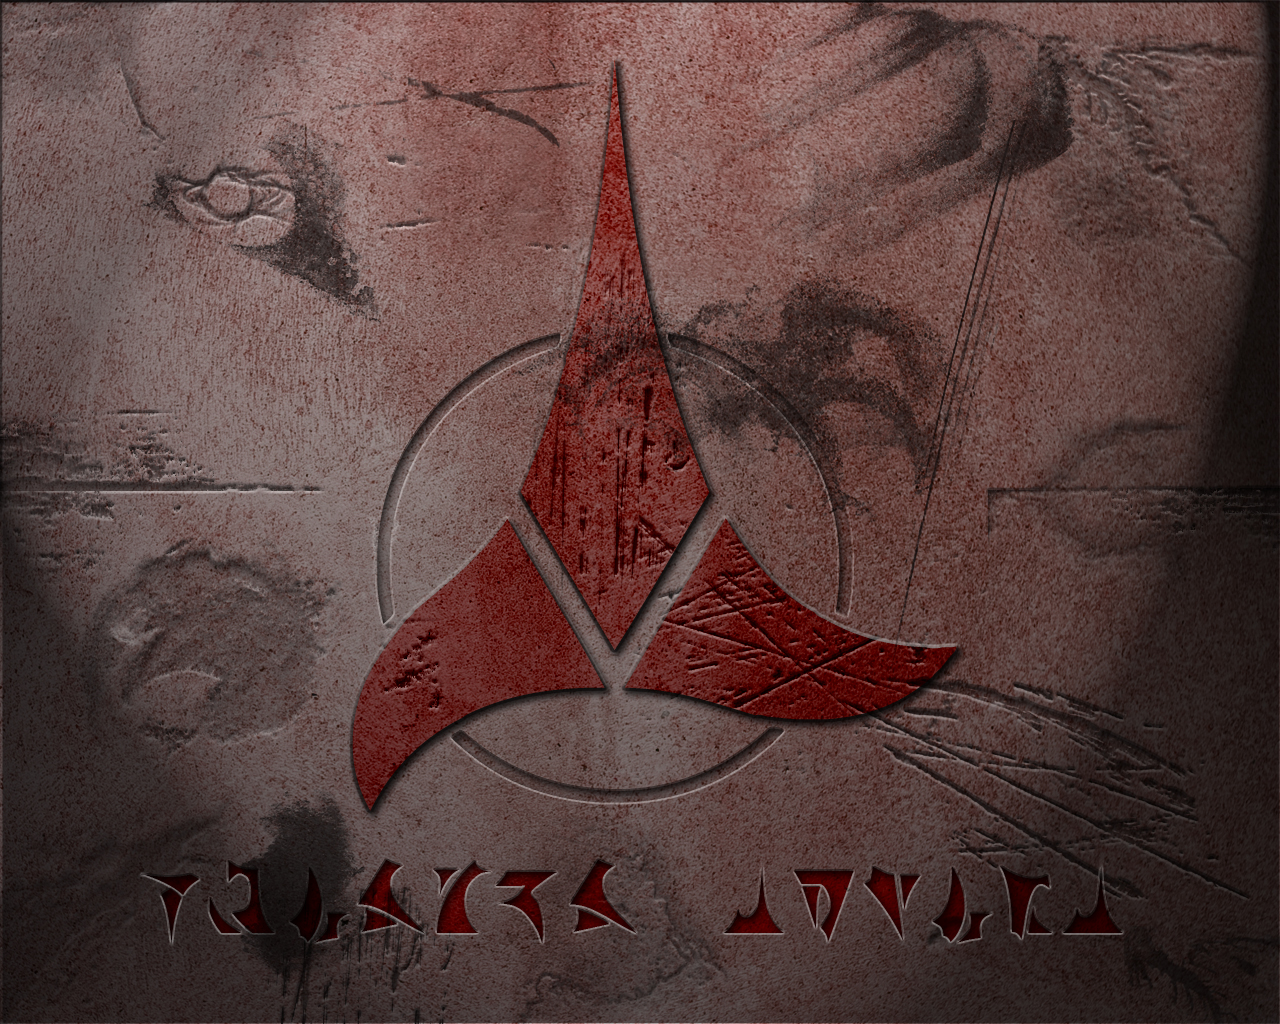 star trek klingon wallpaper by imaximus fan art wallpaper movies tv 1280x1024